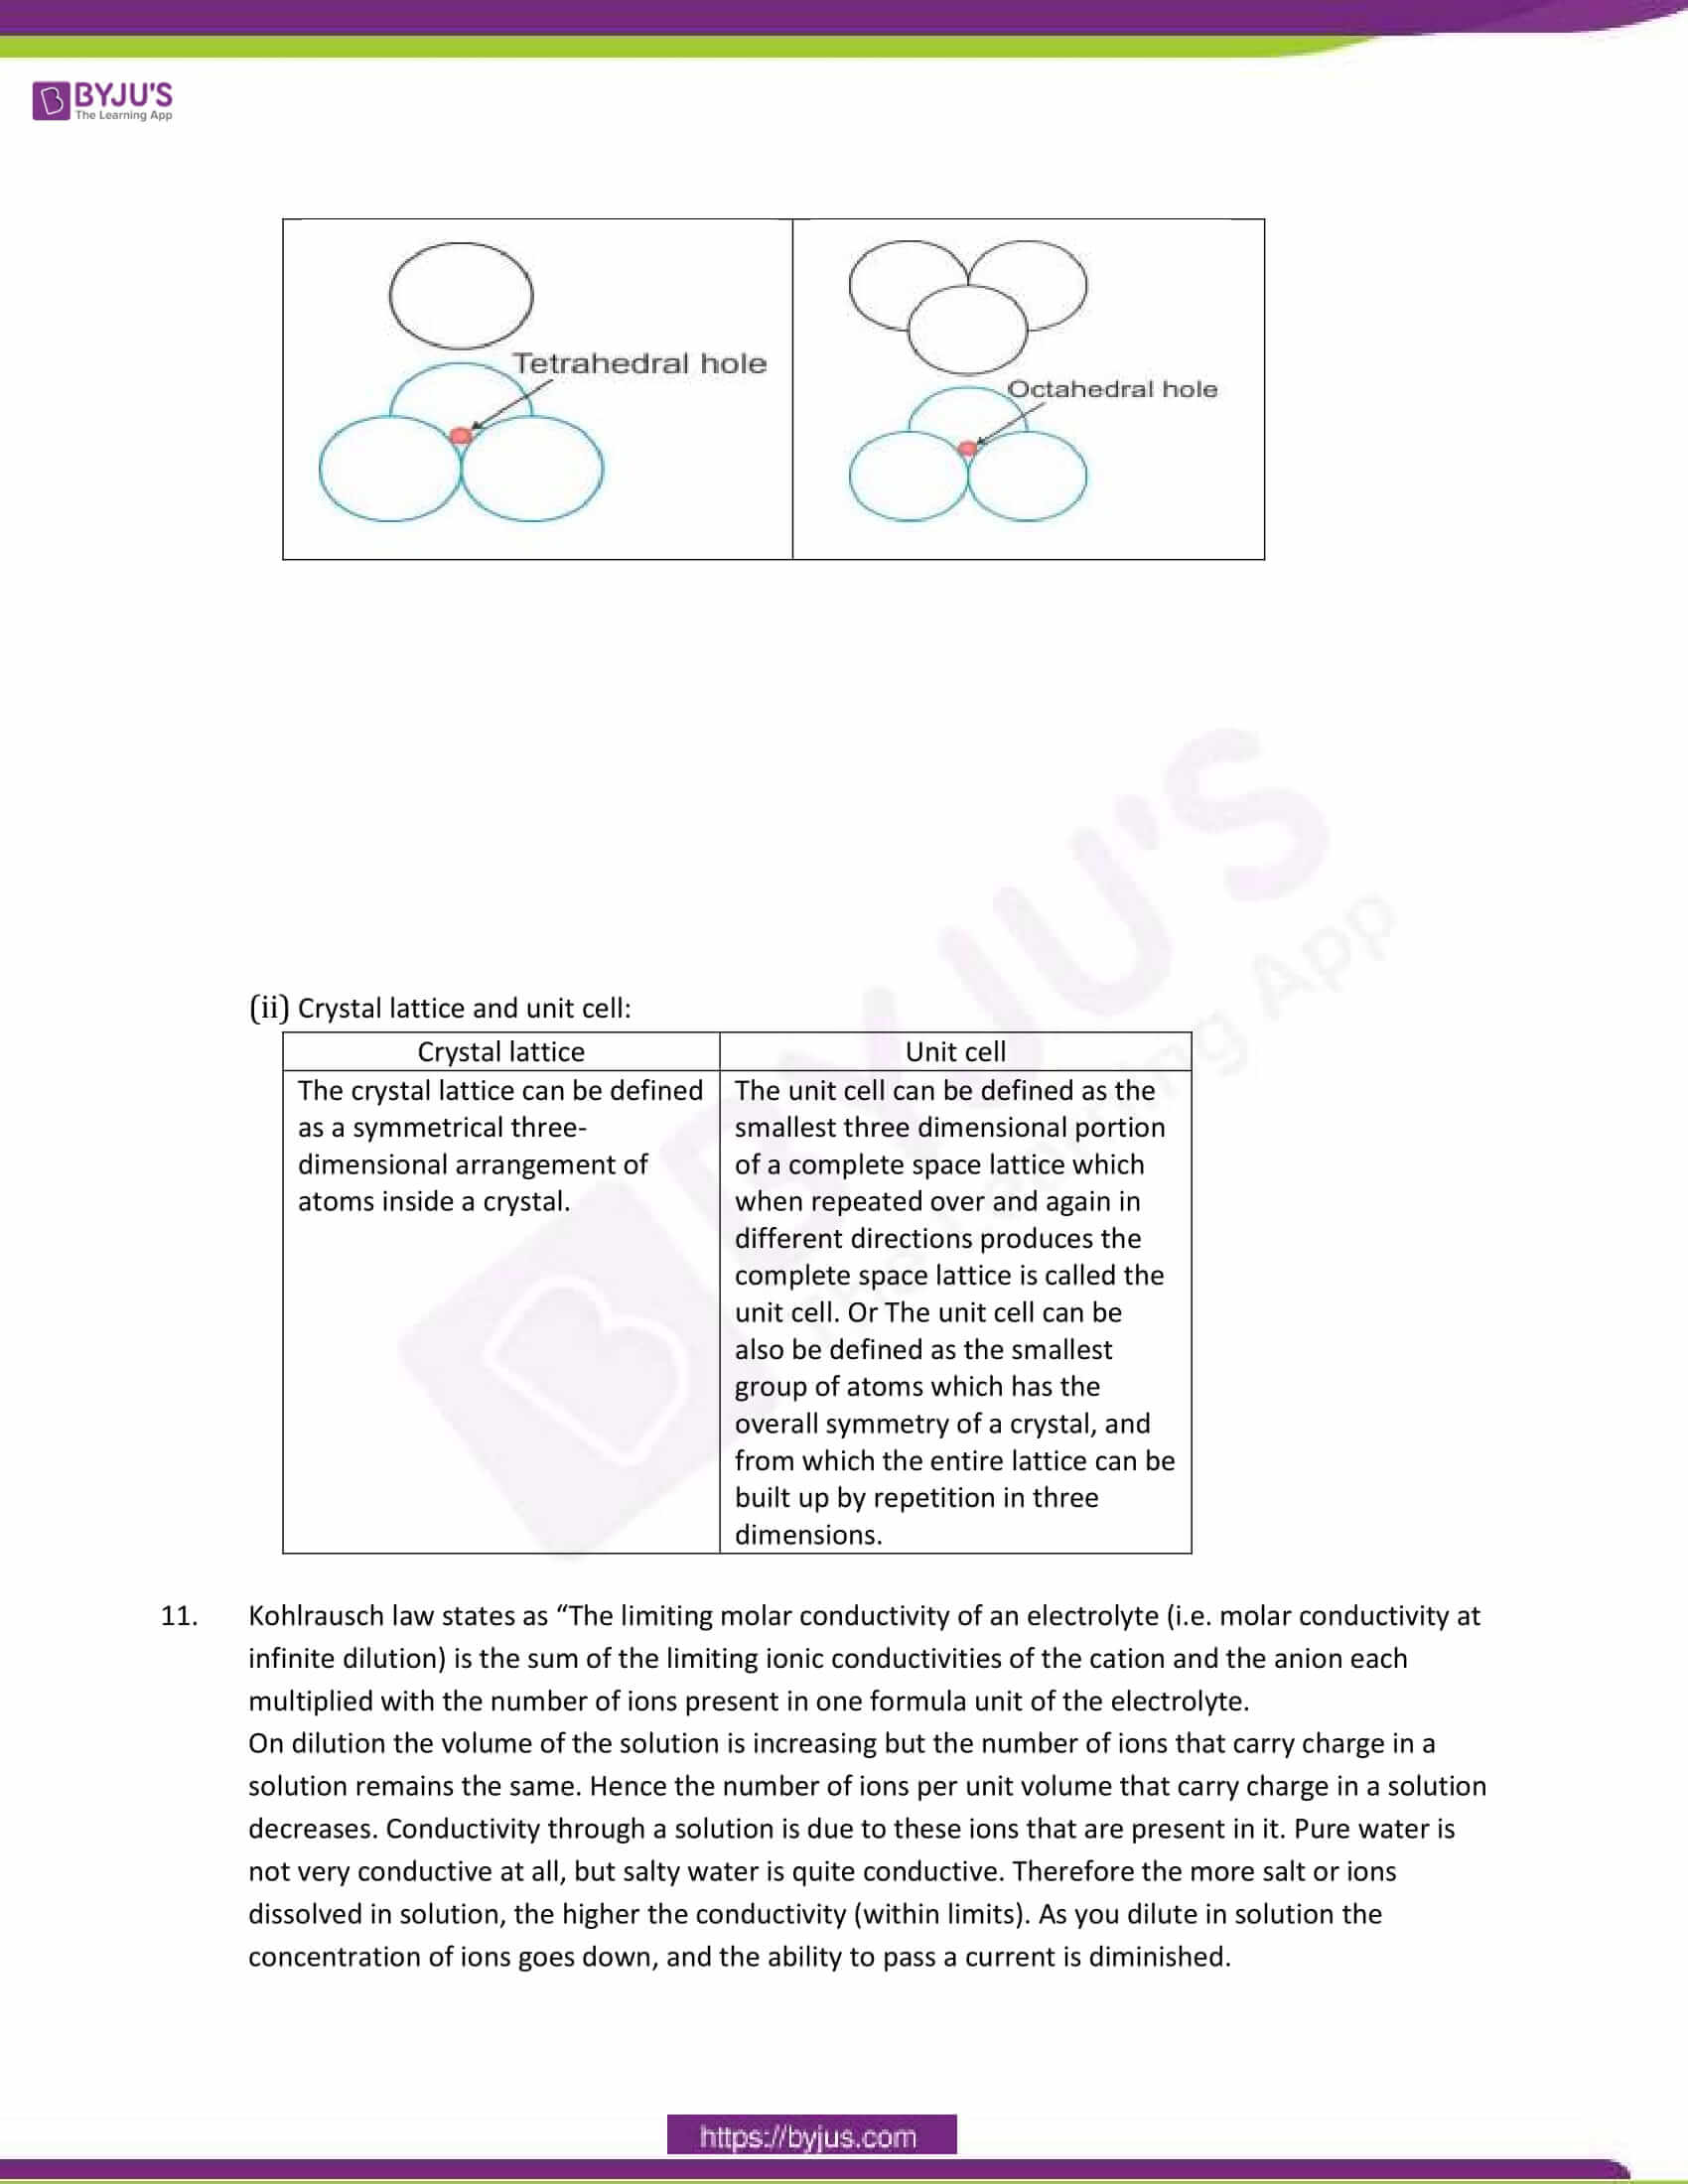 cbse class 12 chemistry sample paper solution set 4